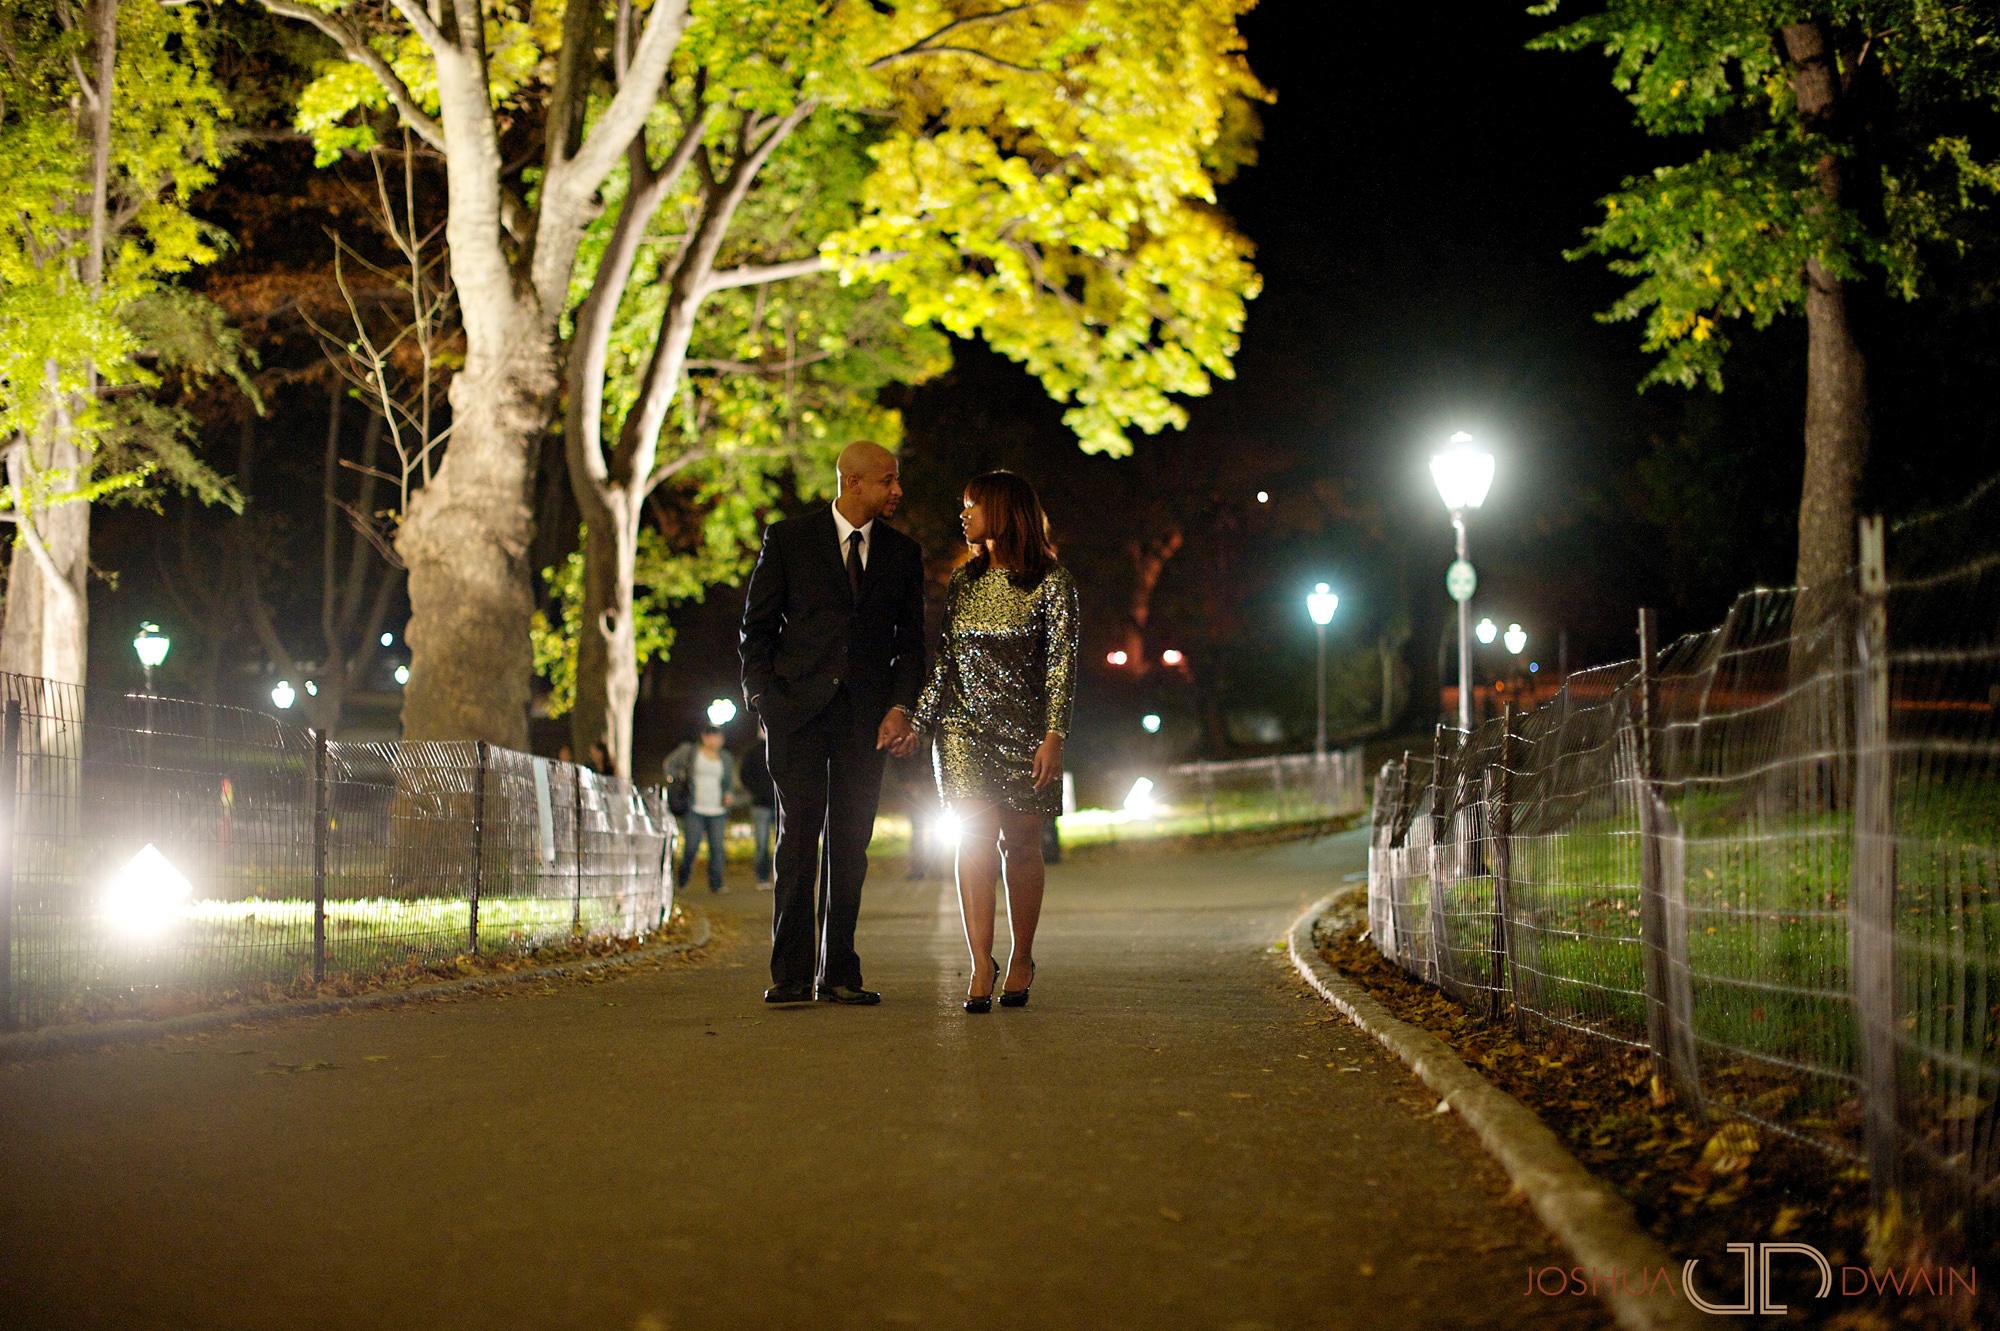 carol-shiloh-015-central-park-new-york-city-engagement-photographer-joshua-dwain-21